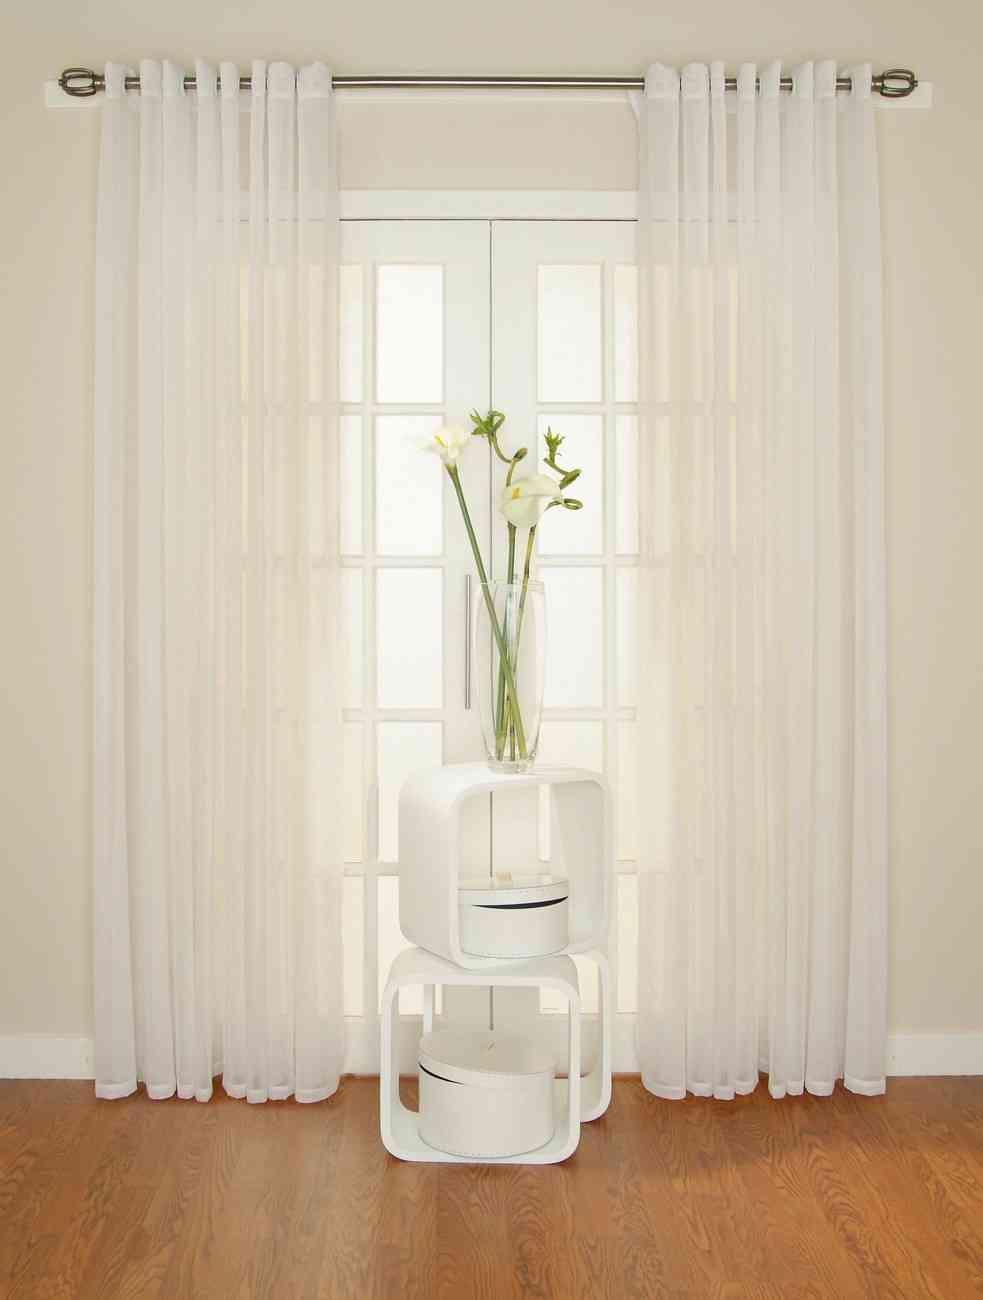 Truco para mantener las cortinas blancas for Cortinas opacas blancas